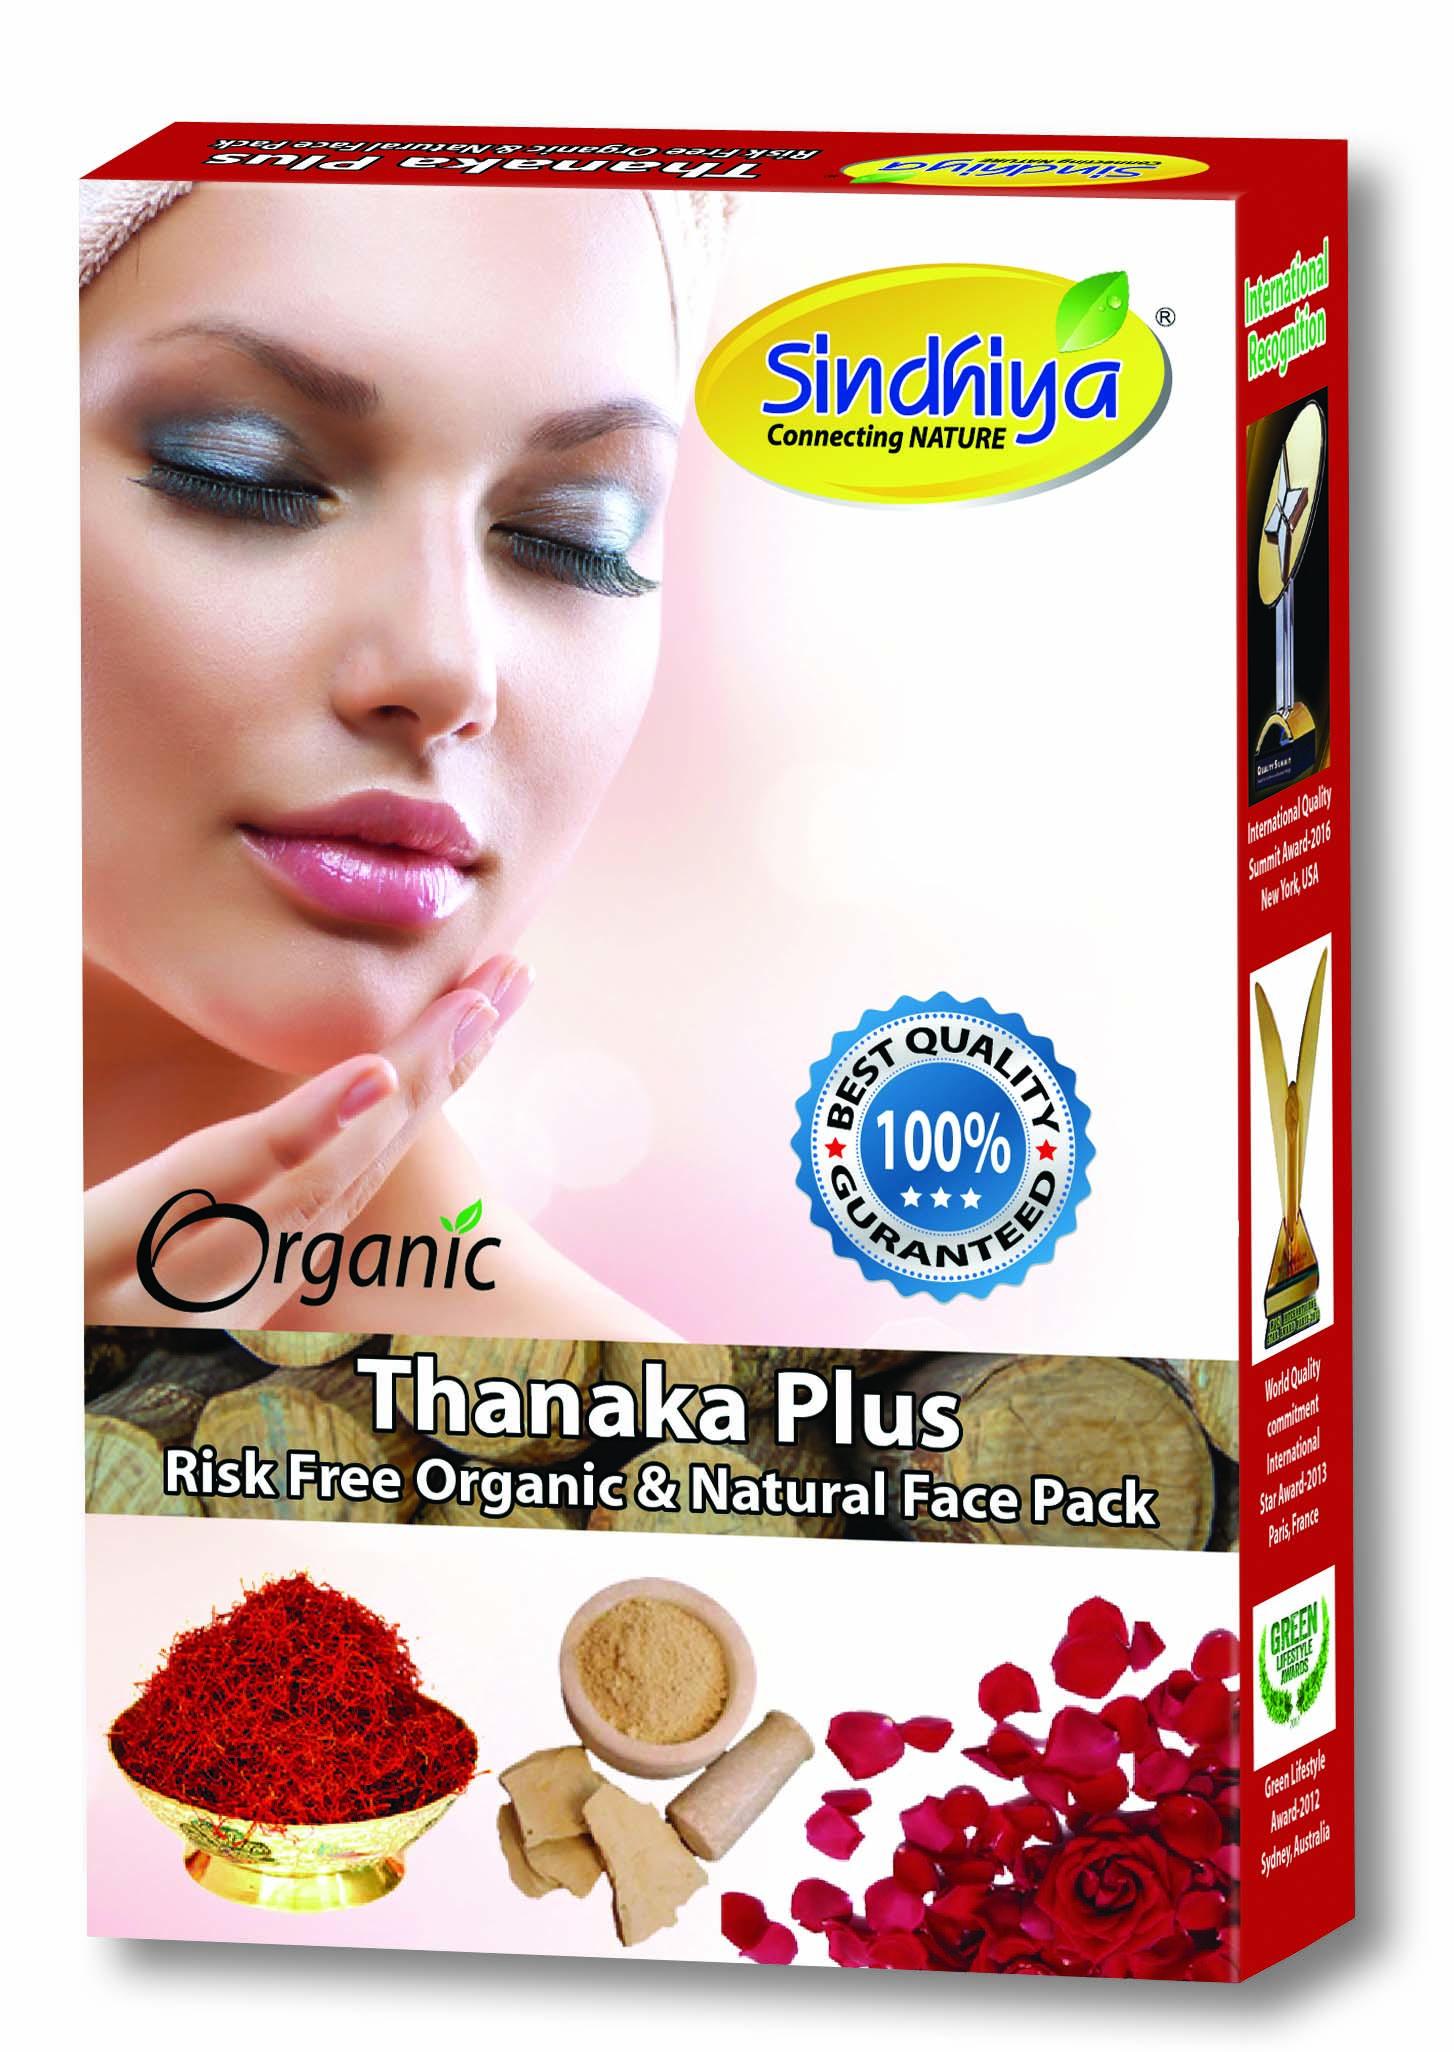 Thanaka Plus - Risk Free Organic & Natural Face Pack